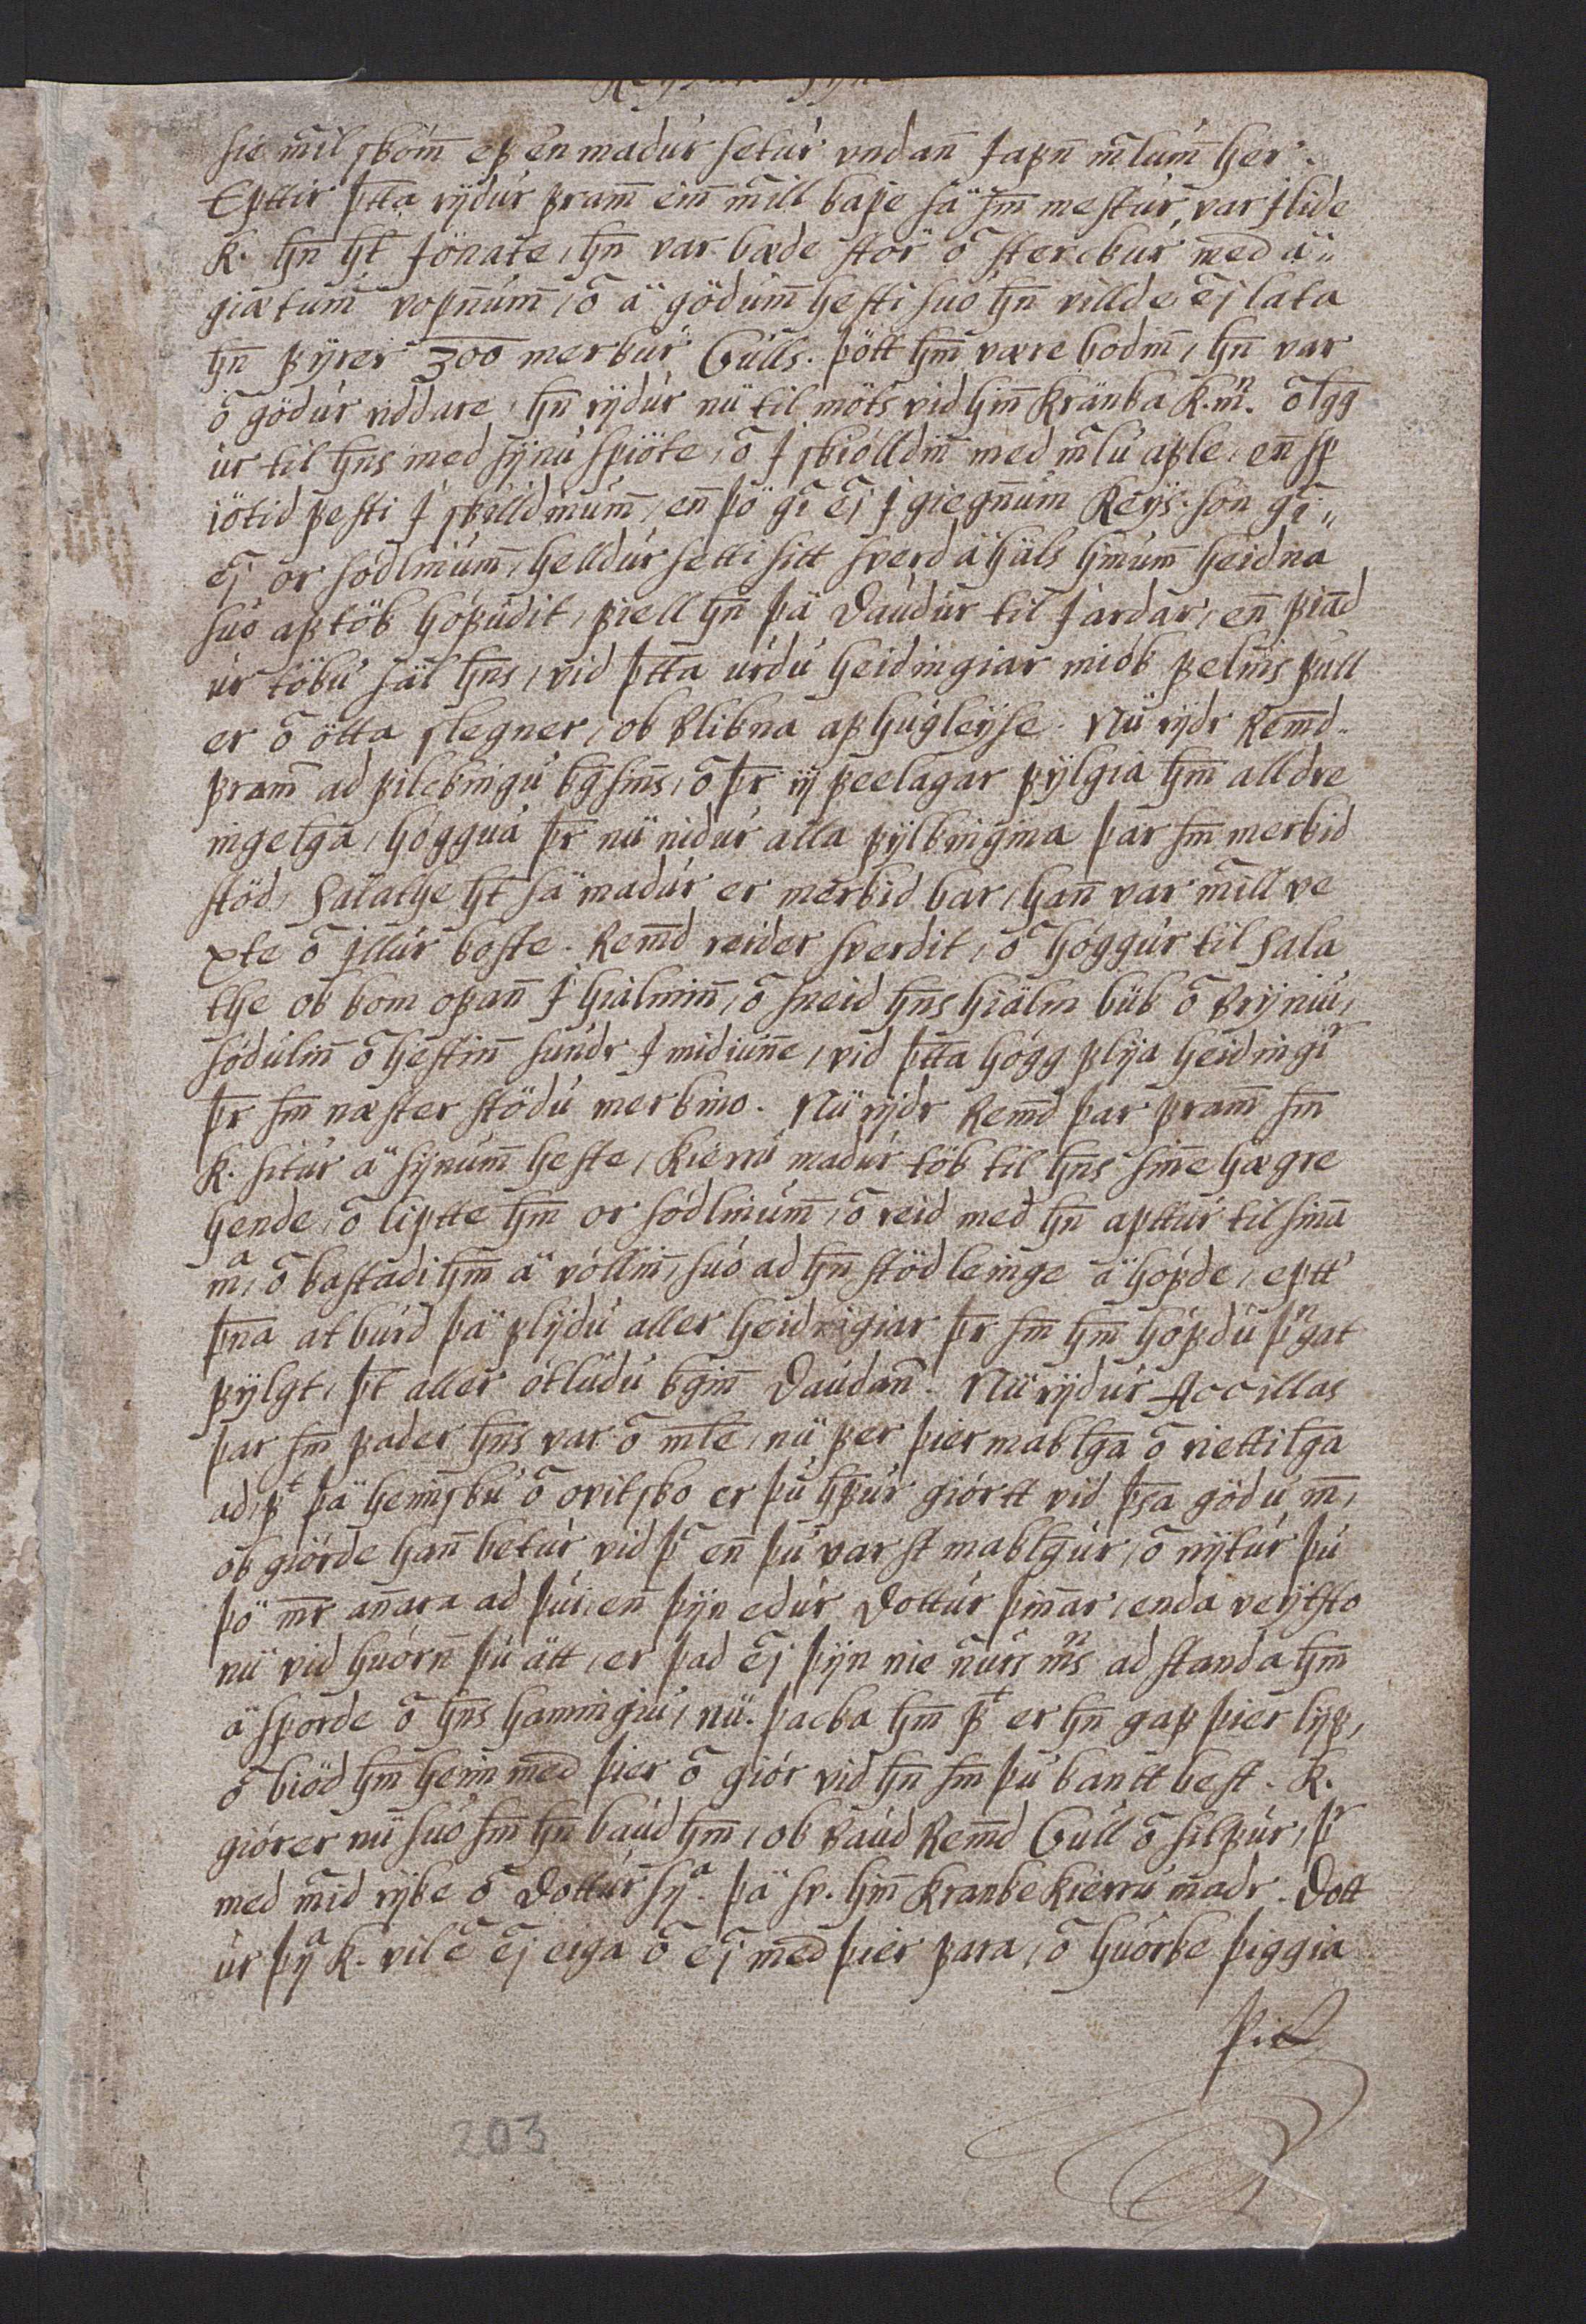 JS 27 fol - 203r